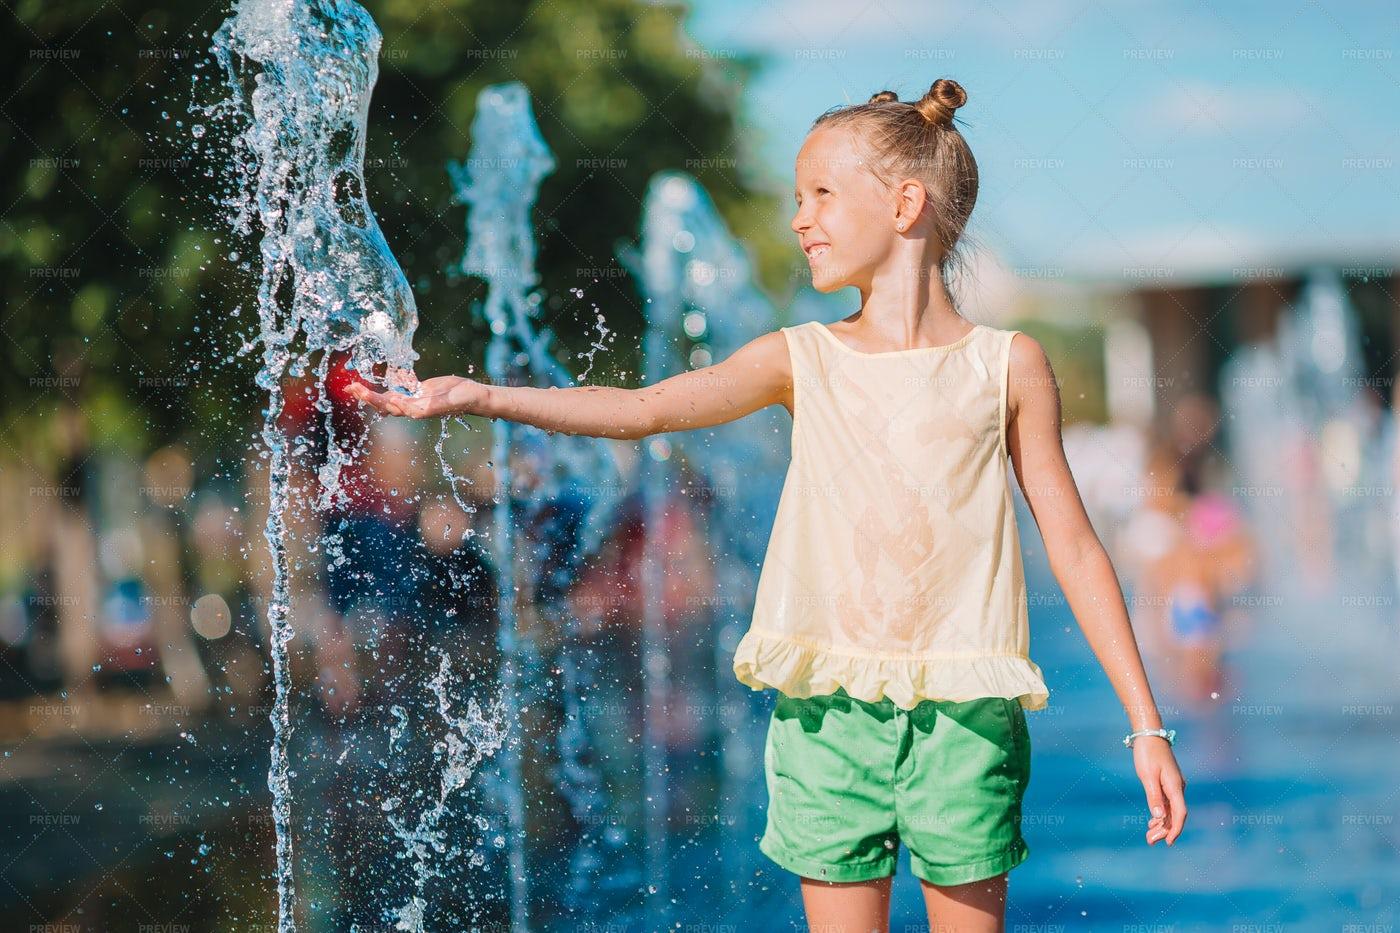 Girl Touching Water Fountain: Stock Photos